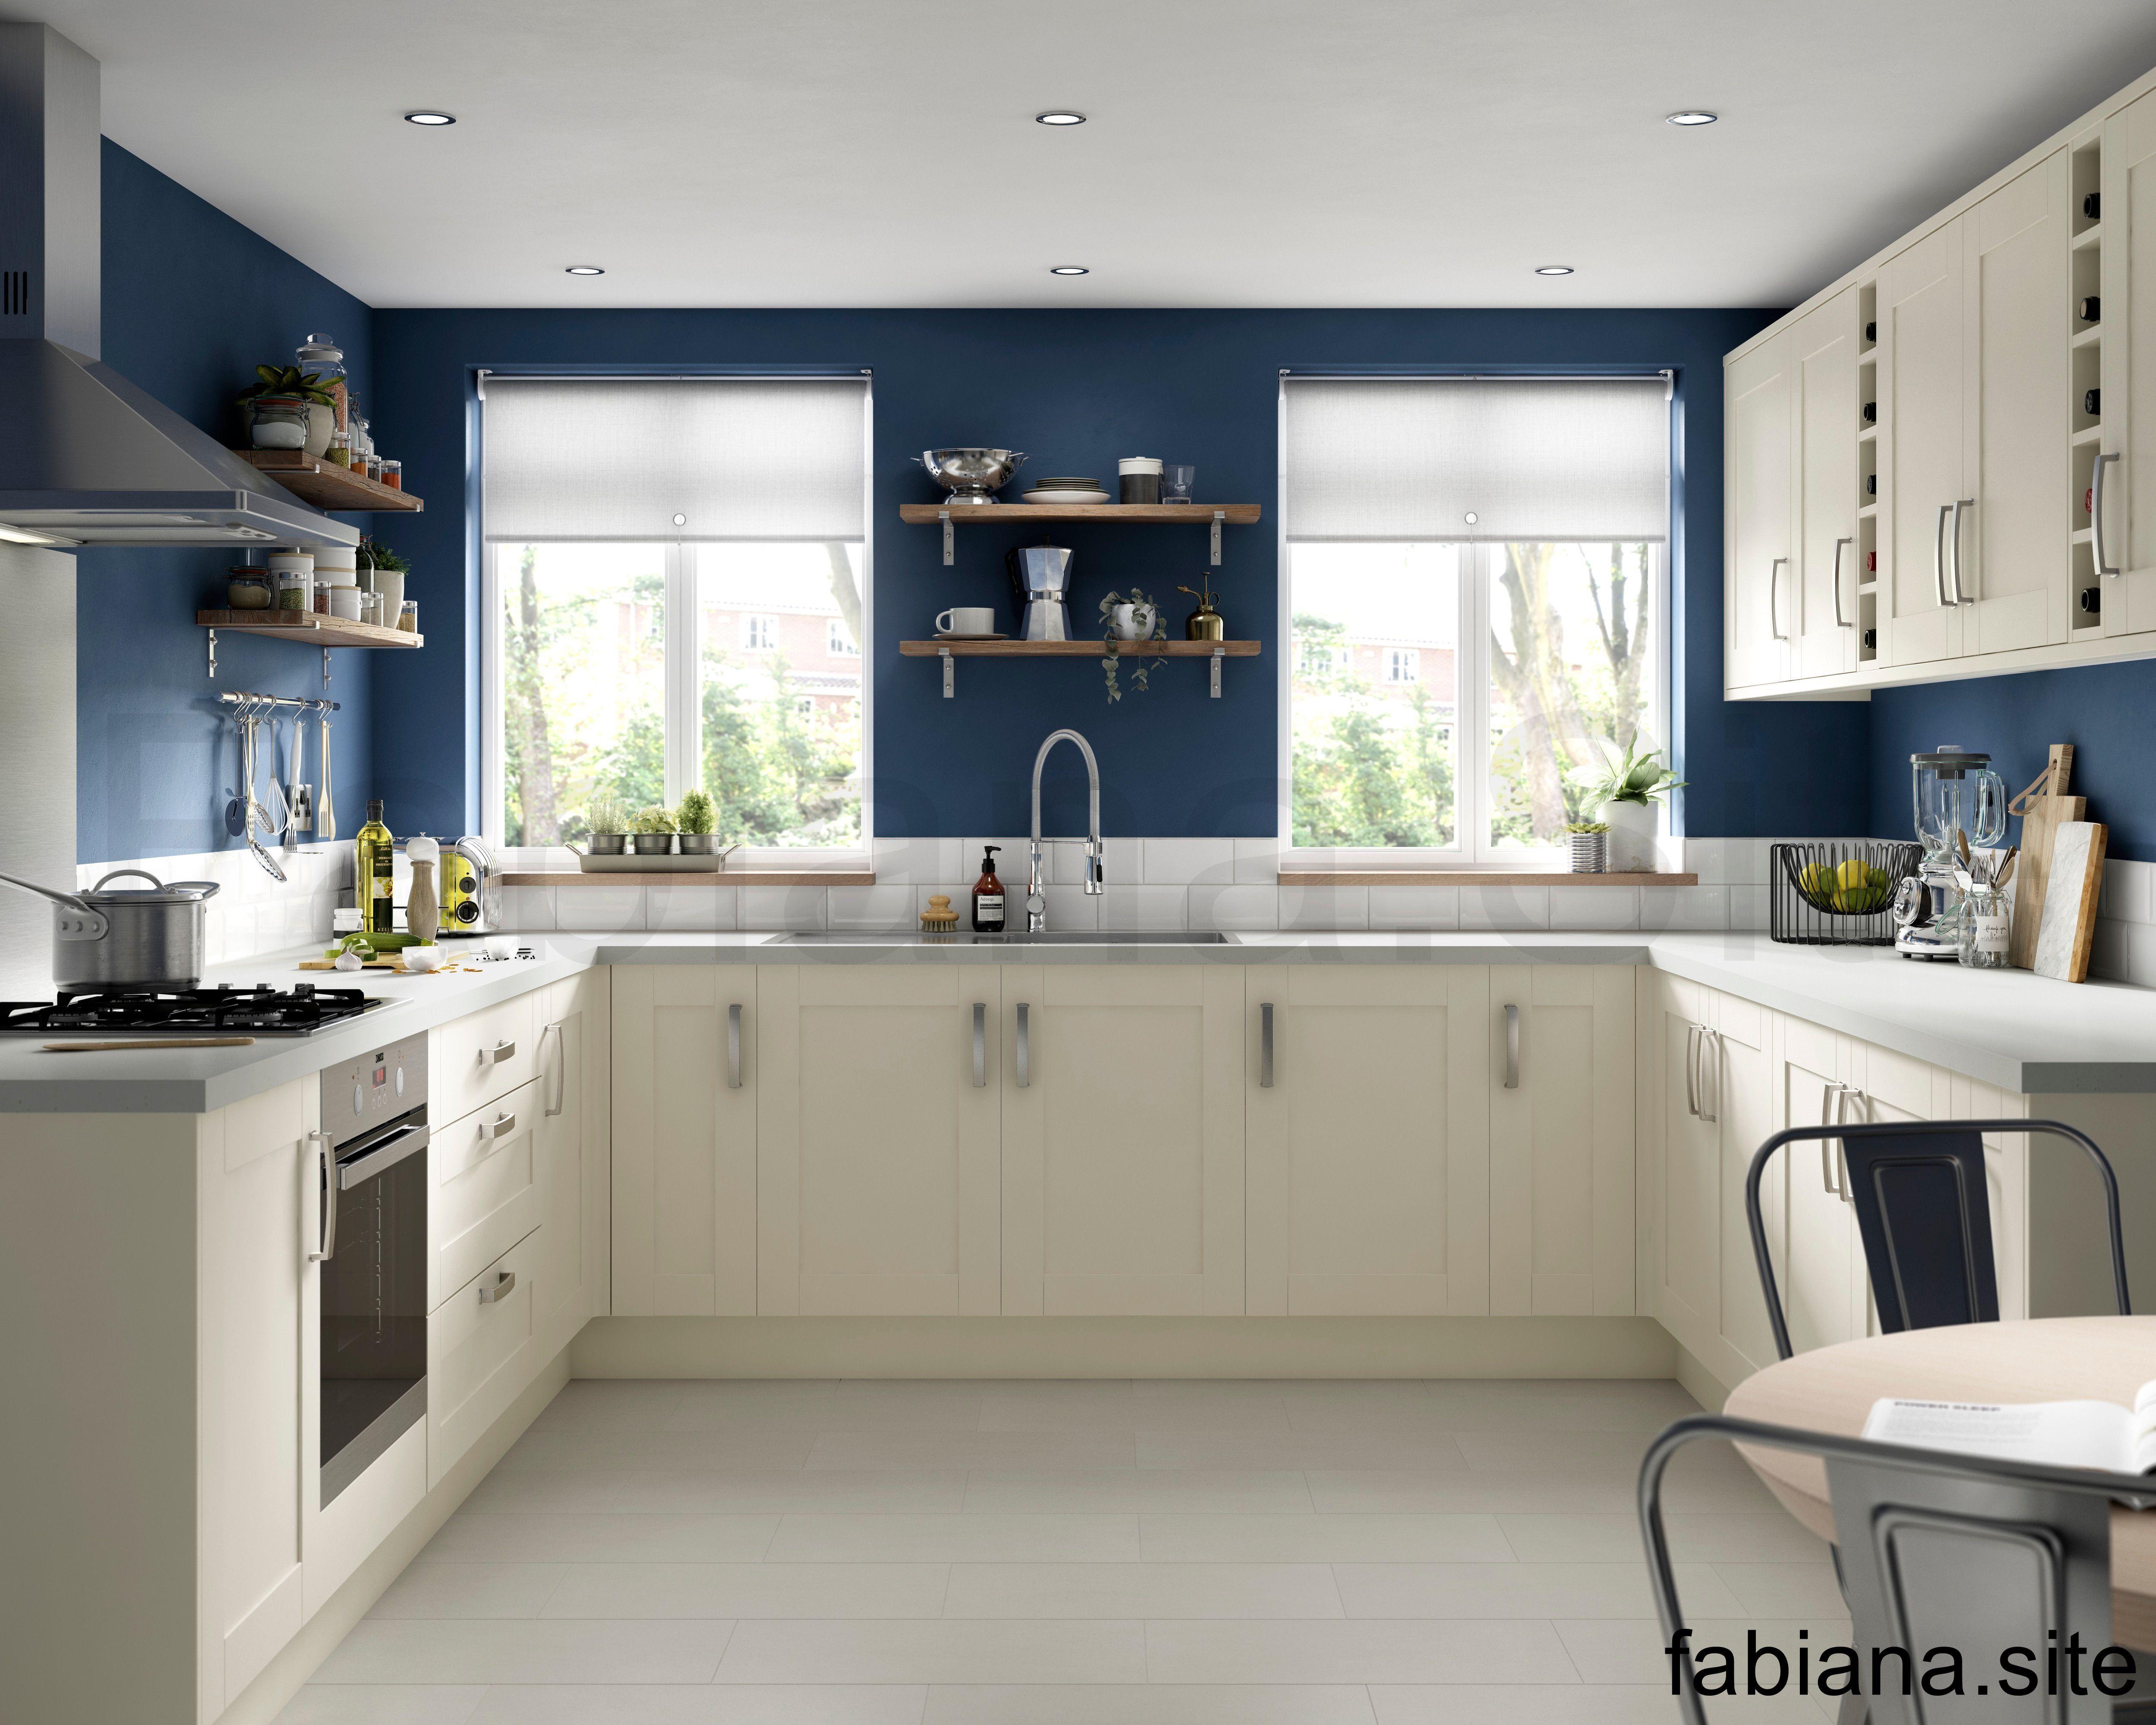 Ikea Kitchen Best Kitchen Ideas 2020 Thiết Kế Nha Bếp Nội Thất Nha Bếp Bếp Ikea